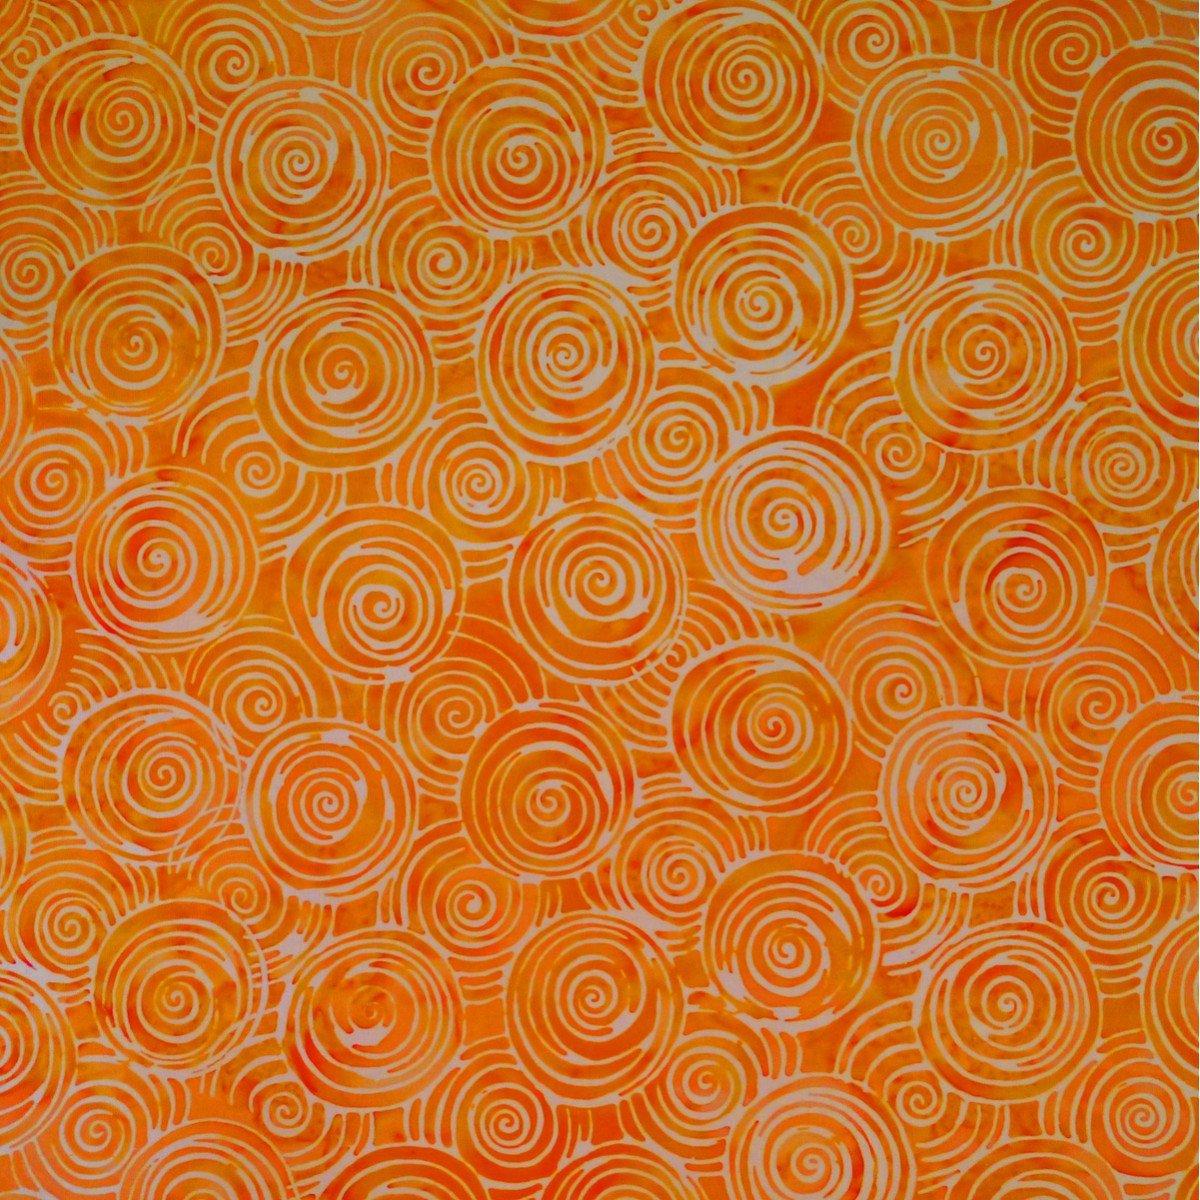 Batik by Mirah - Peach Bite - Arabeske